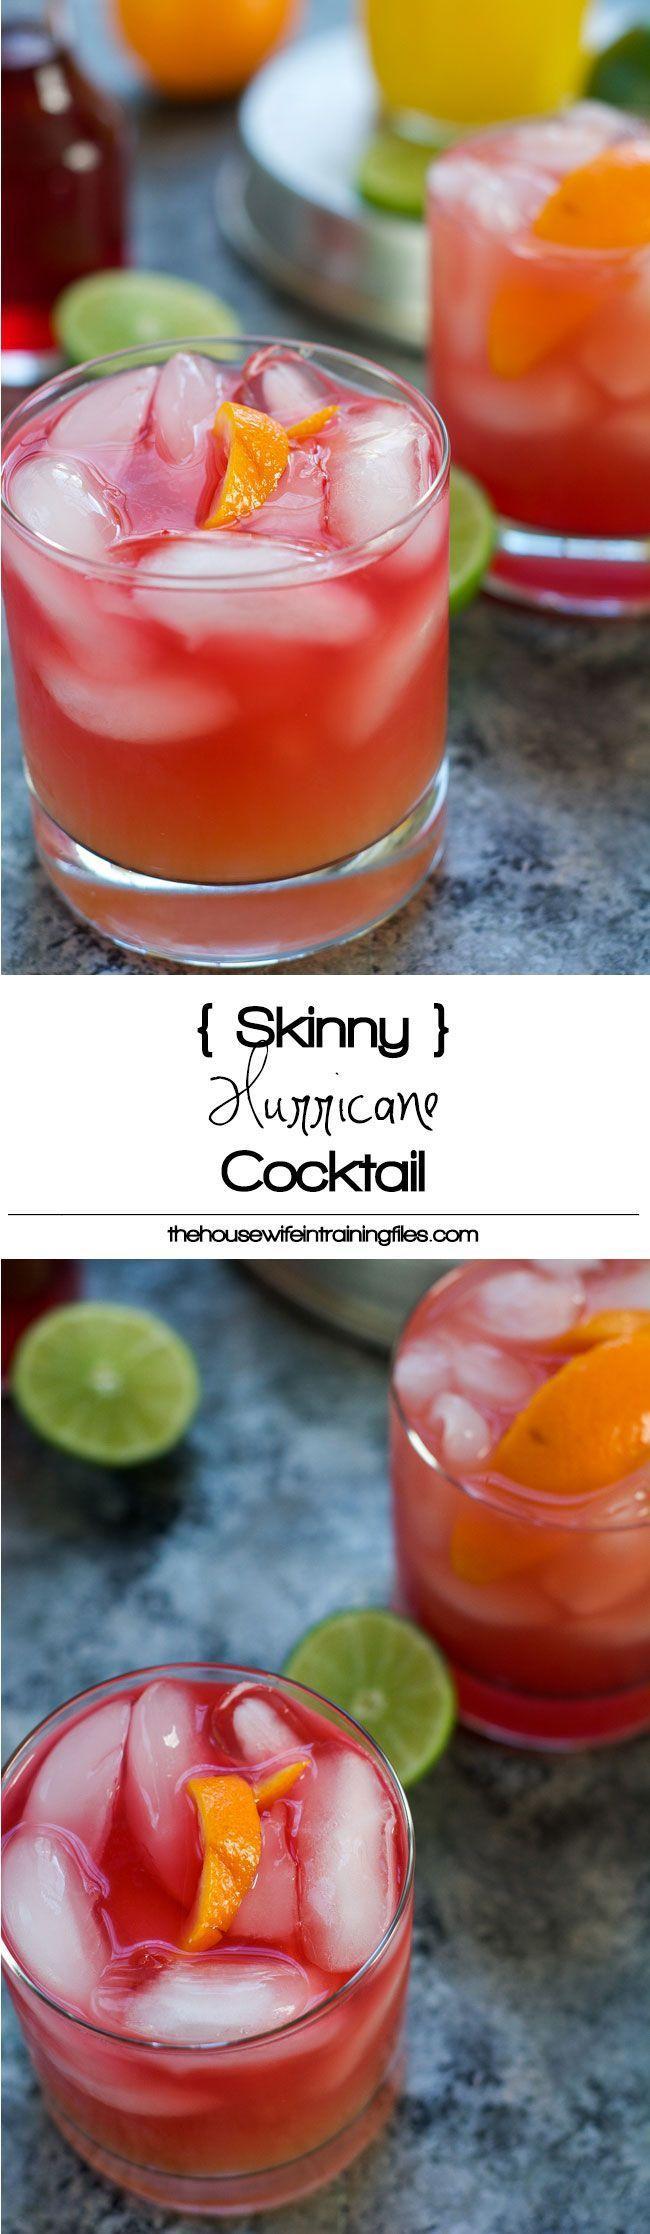 Wedding - Skinny Hurricane Cocktail